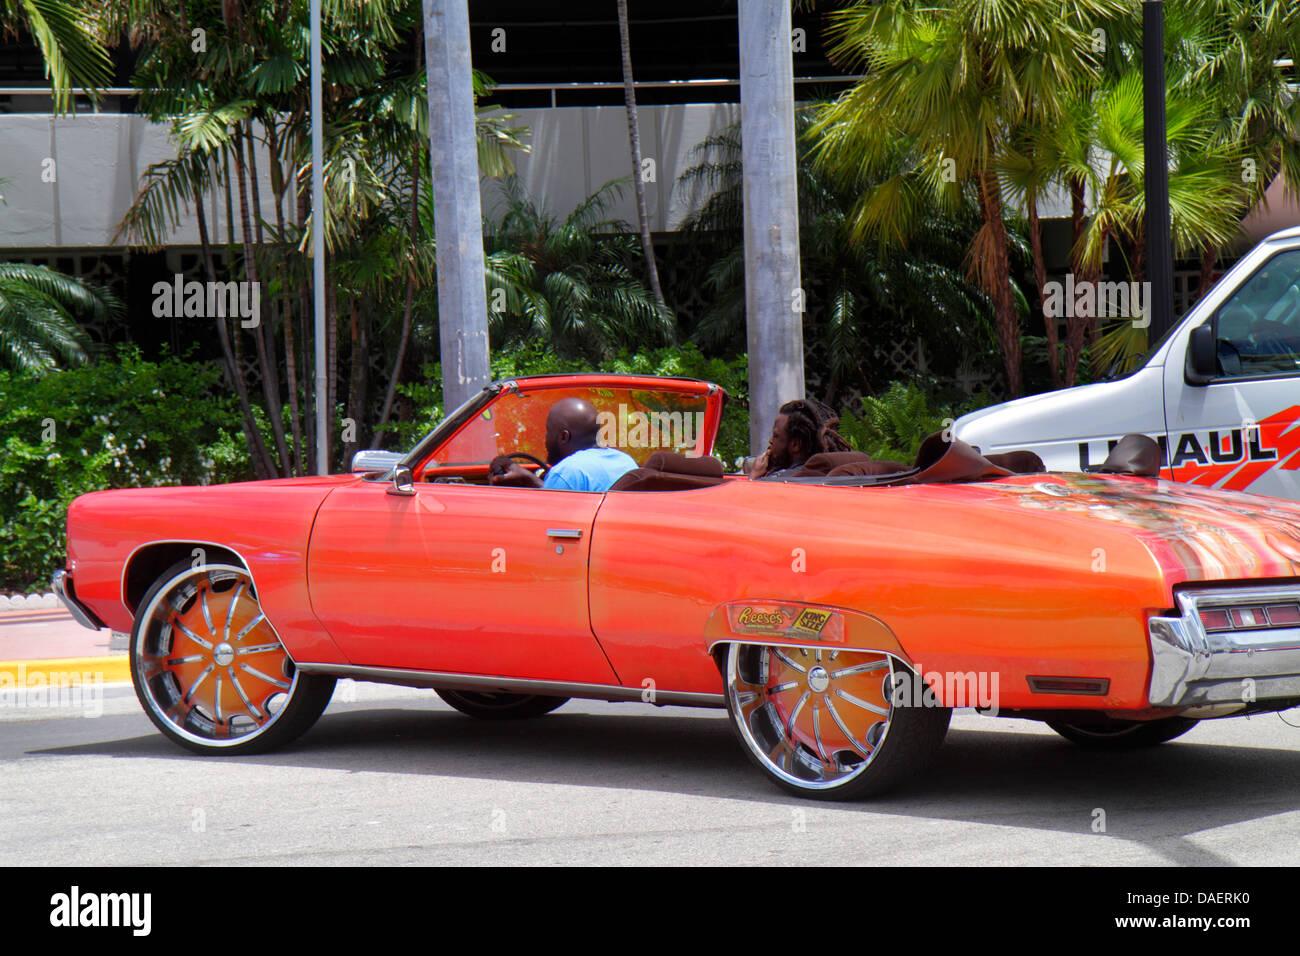 Miami Beach Florida Ocean Drive Black Man Driving Driver Customized Pimped Out Ride Hip Hop Car Convertible